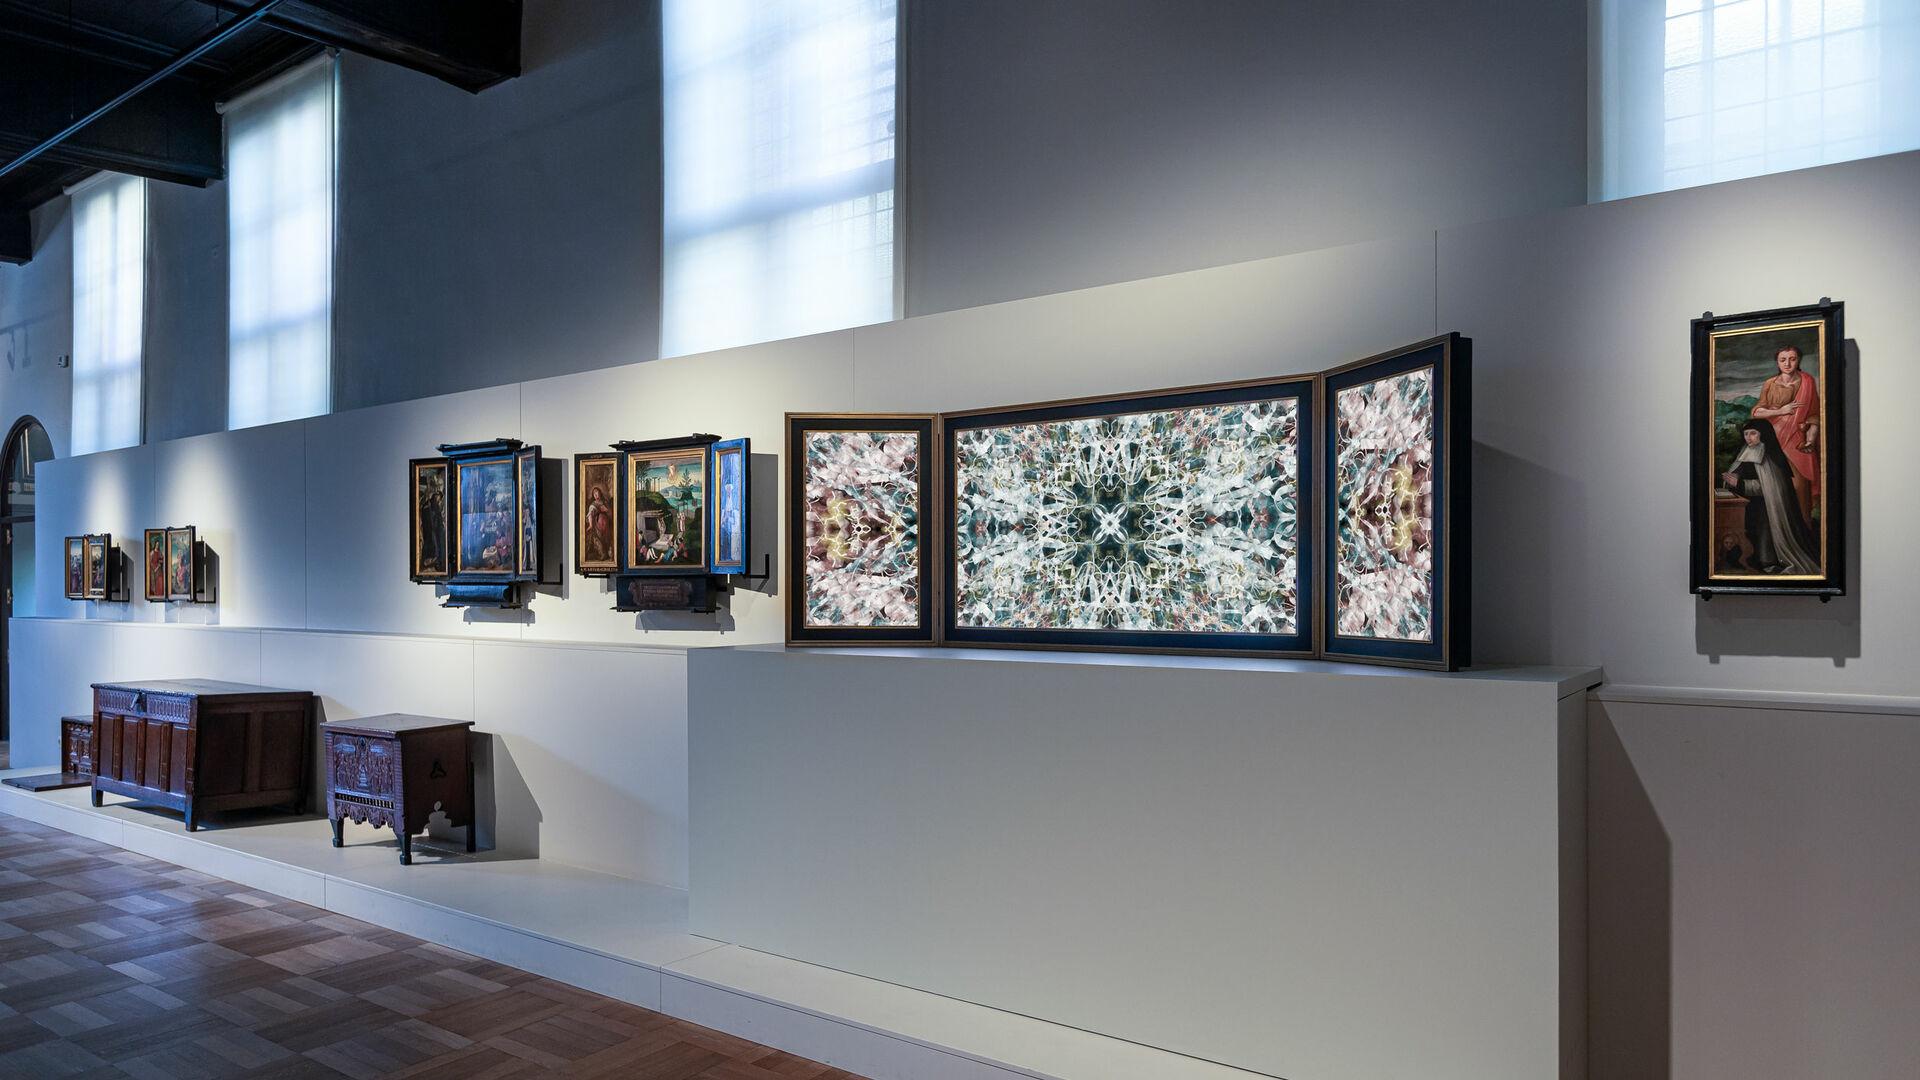 Laura Splan: Disentanglement at Bruges Triennial